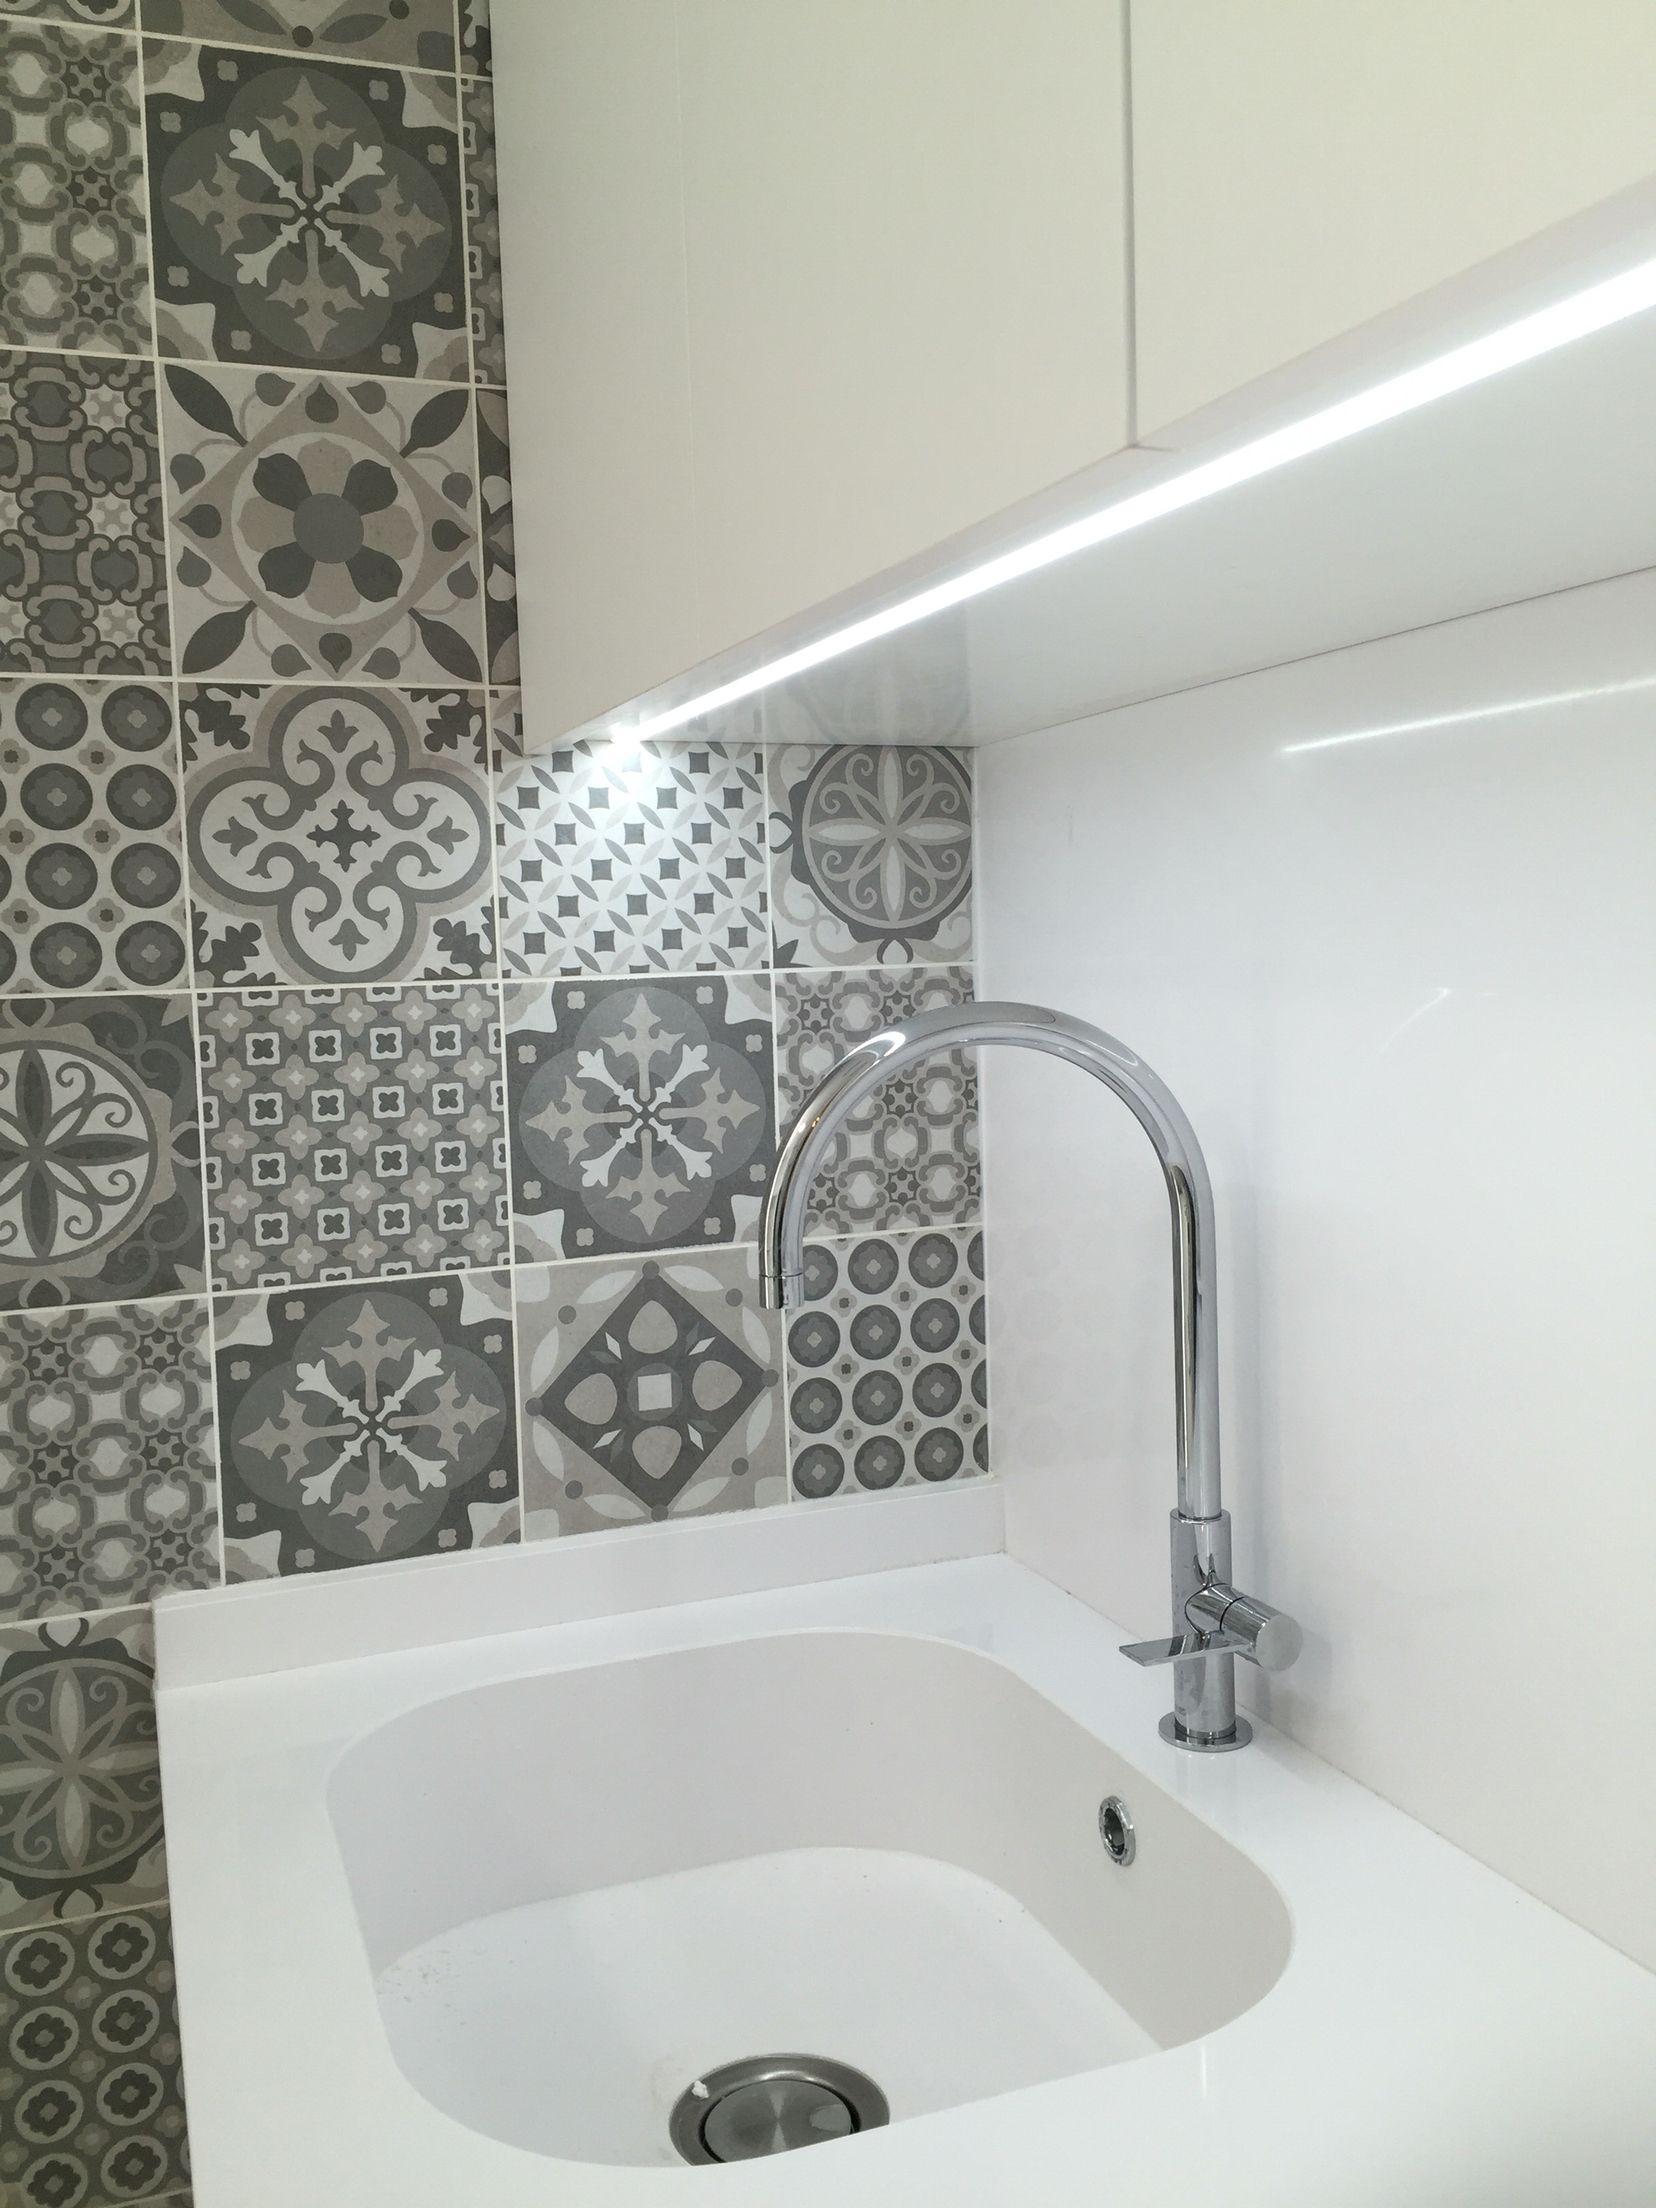 Interiorismo para cocina detalle de iluminaci n tira - Iluminacion led decorativa ...